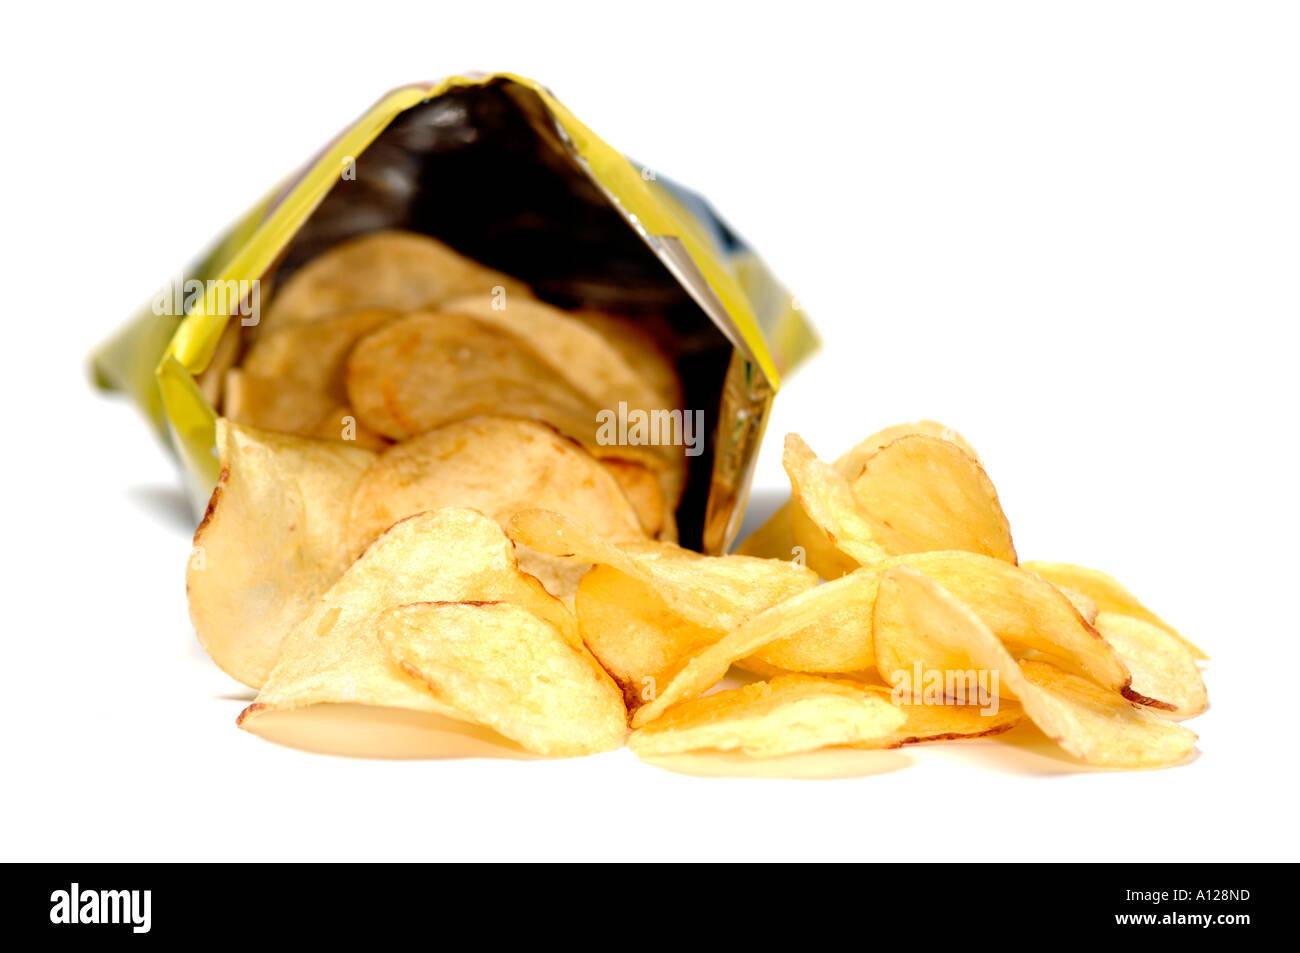 Open bag of crisps - Stock Image